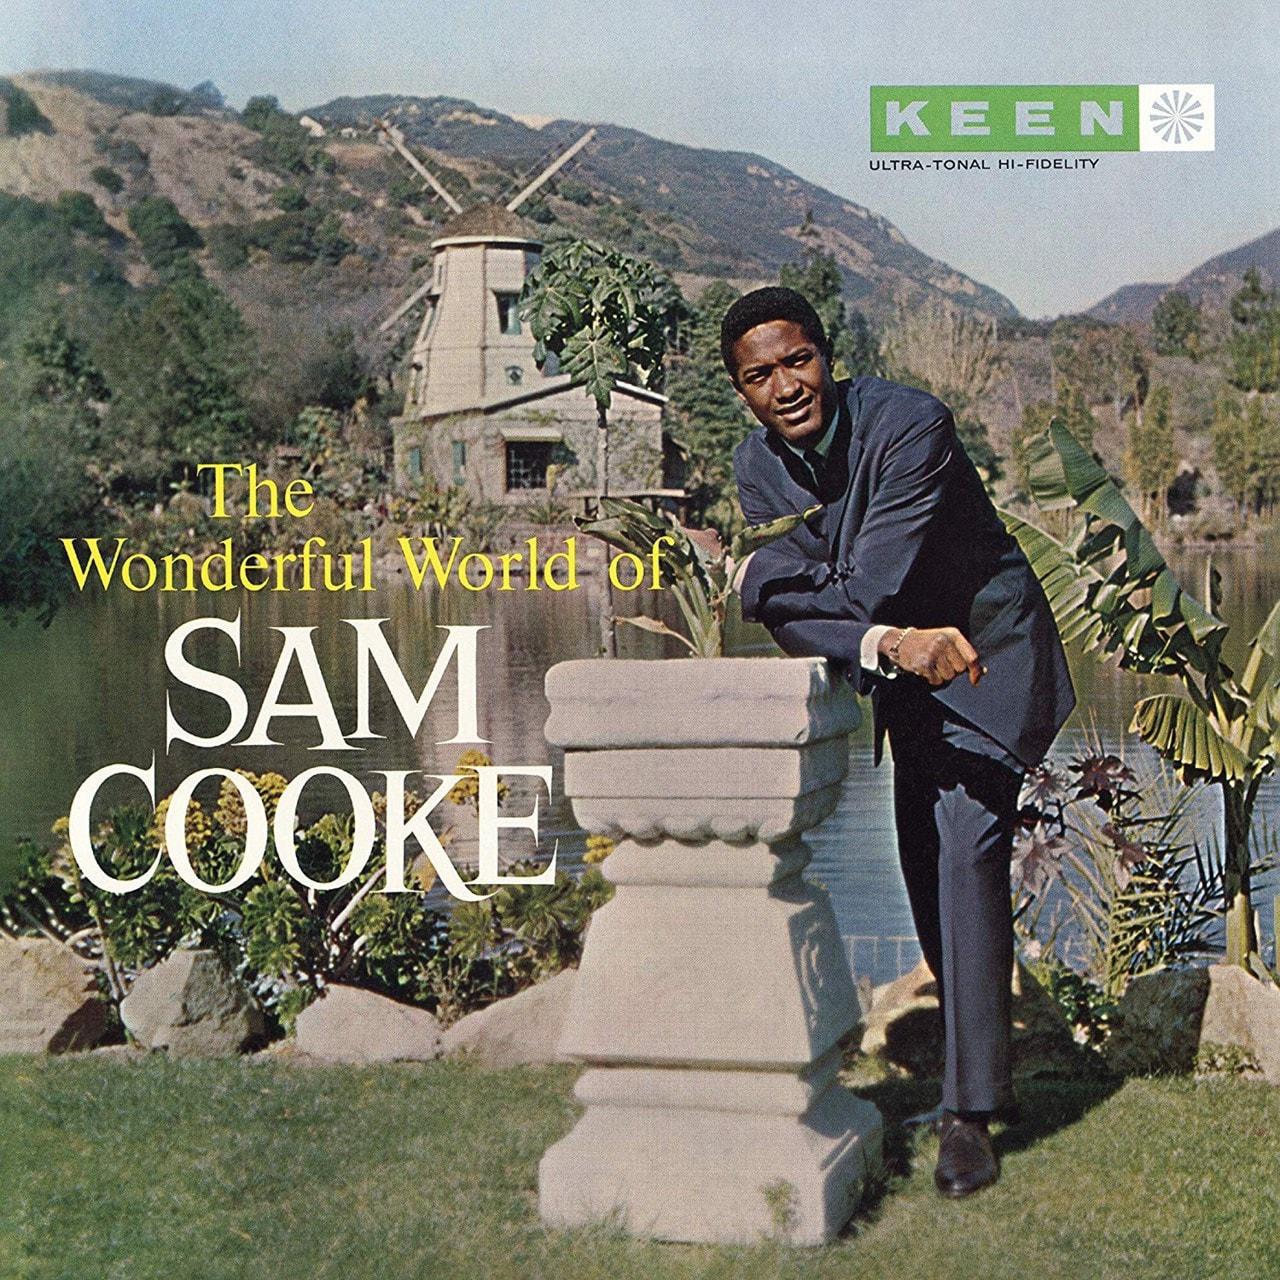 The Wonderful World of Sam Cooke - 1